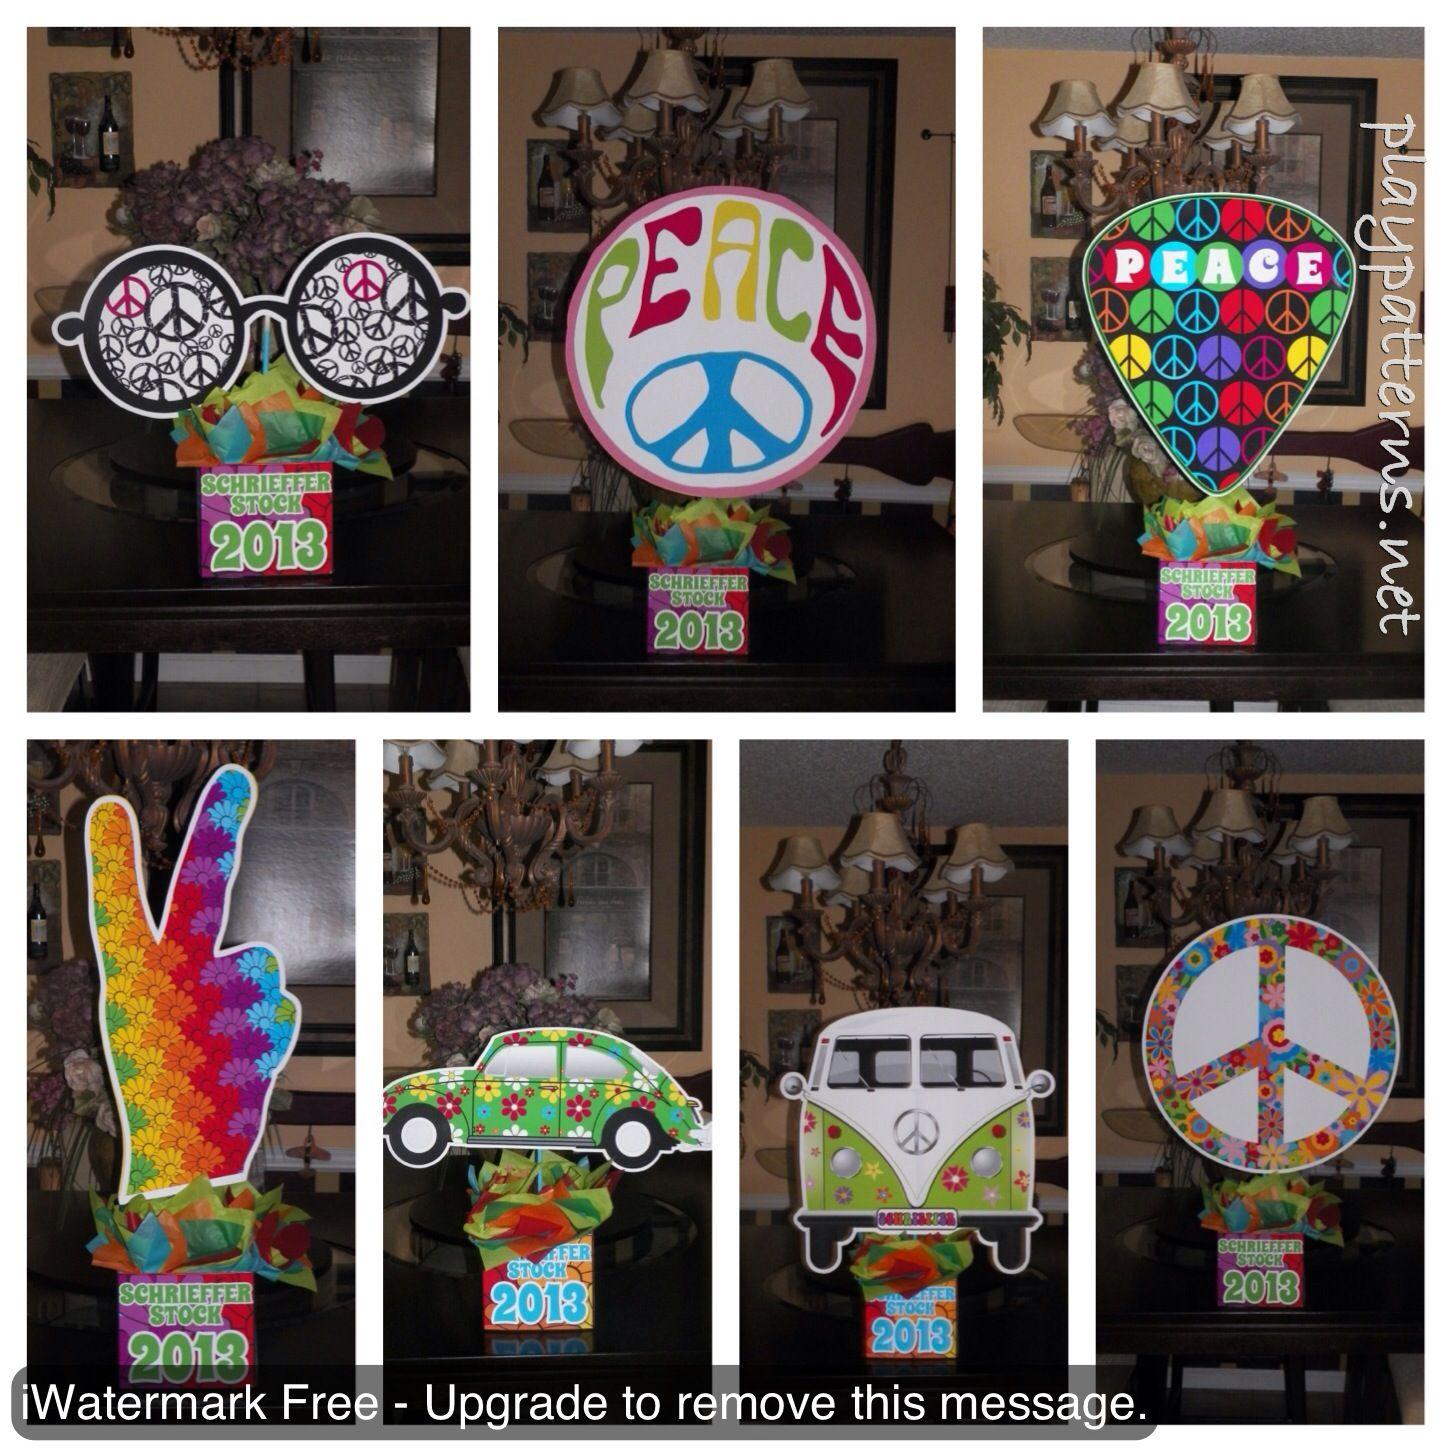 70s Theme Party Decorations Ideas Part - 49: 70u0027s Peace Disco Retro Woodstock Birthday Party Centerpieces.